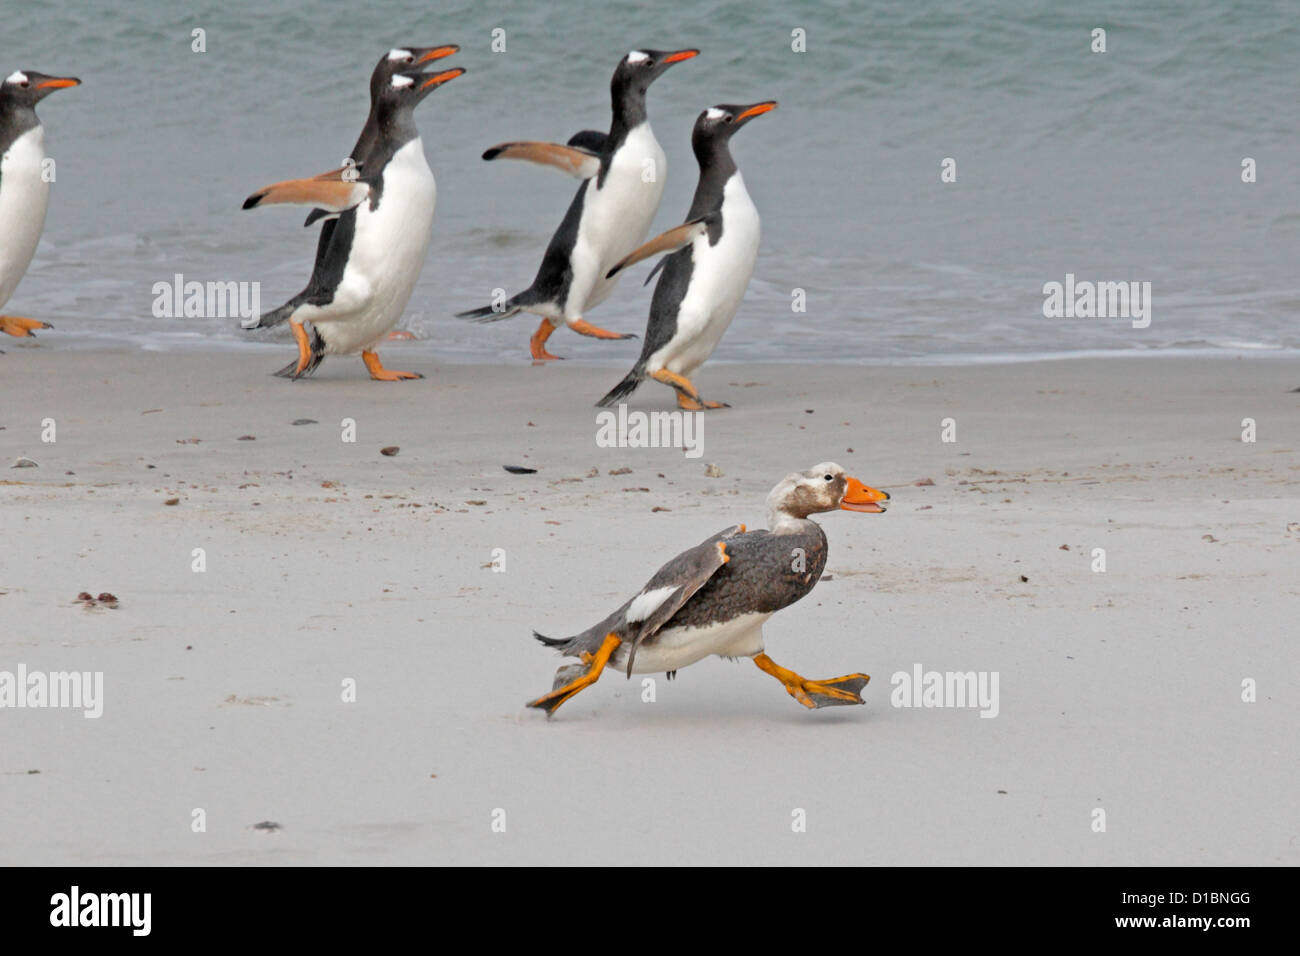 Falkland island Flightless steamer duck and Gentoo penguins running on a beach - Stock Image